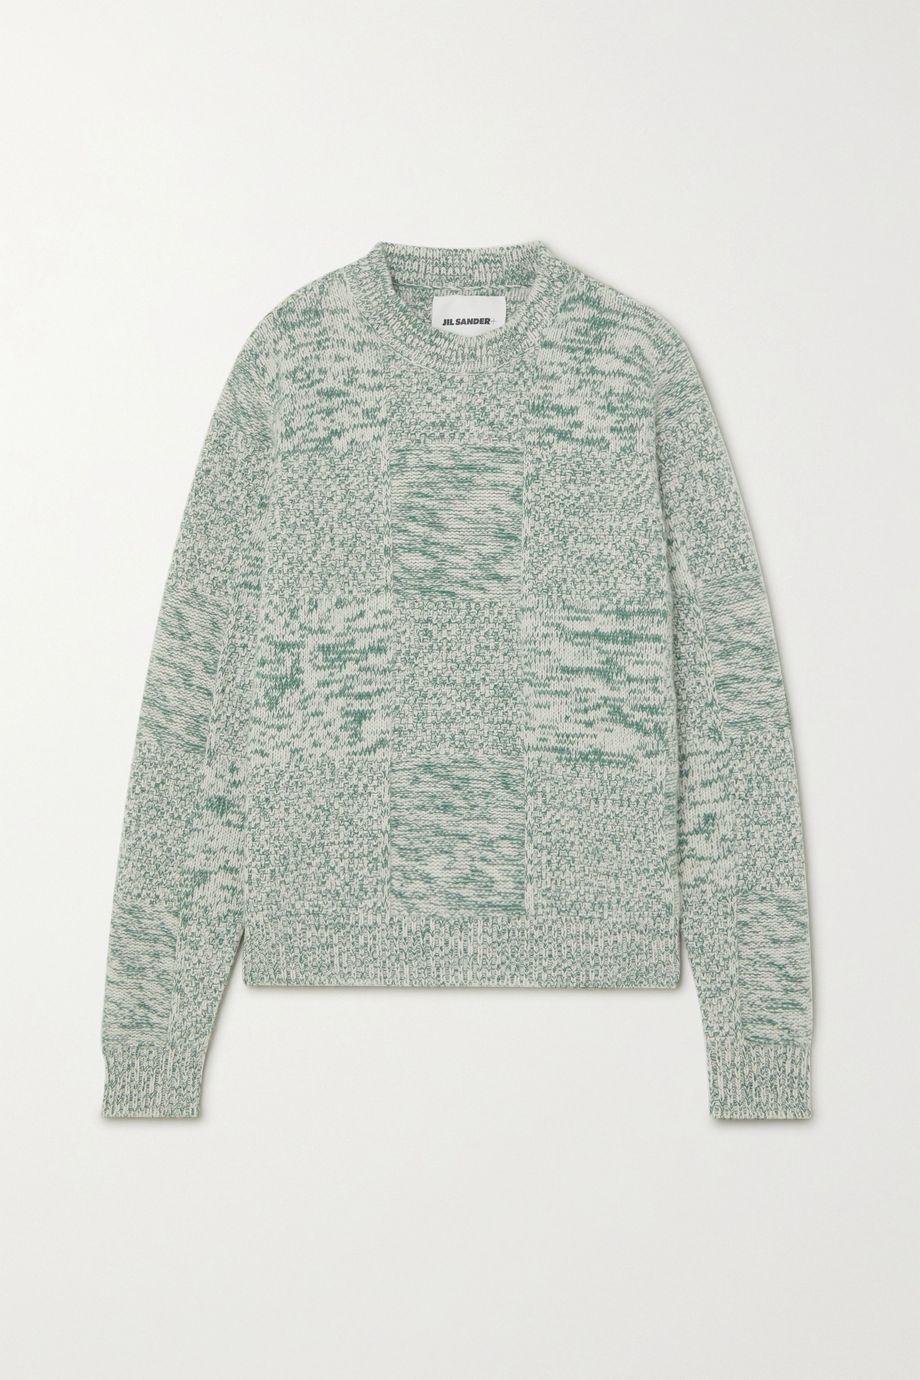 Jil Sander Mélange cashmere sweater